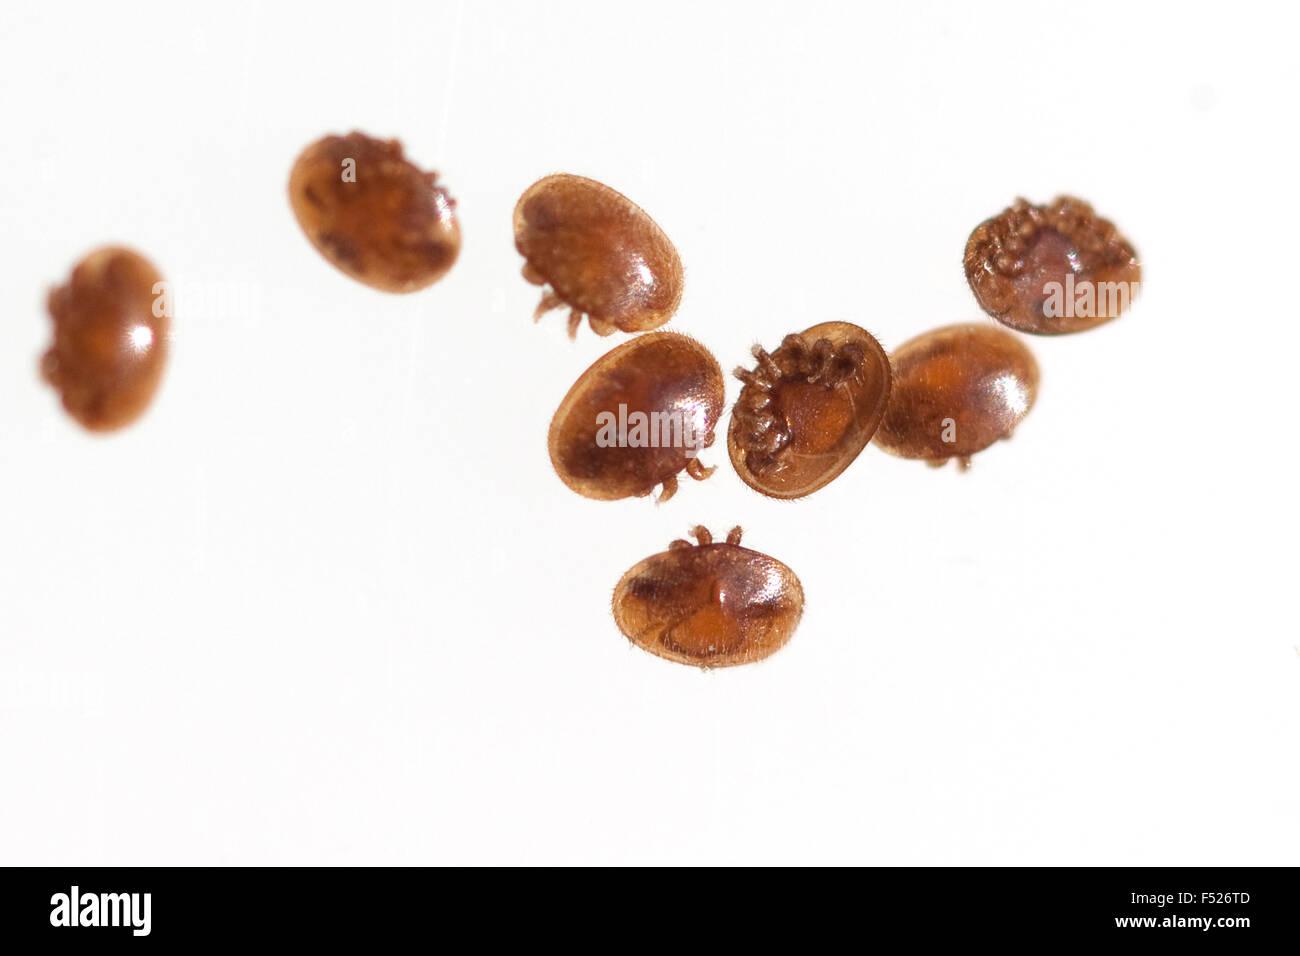 Varroamilbe, Varroa, destructor - Stock Image